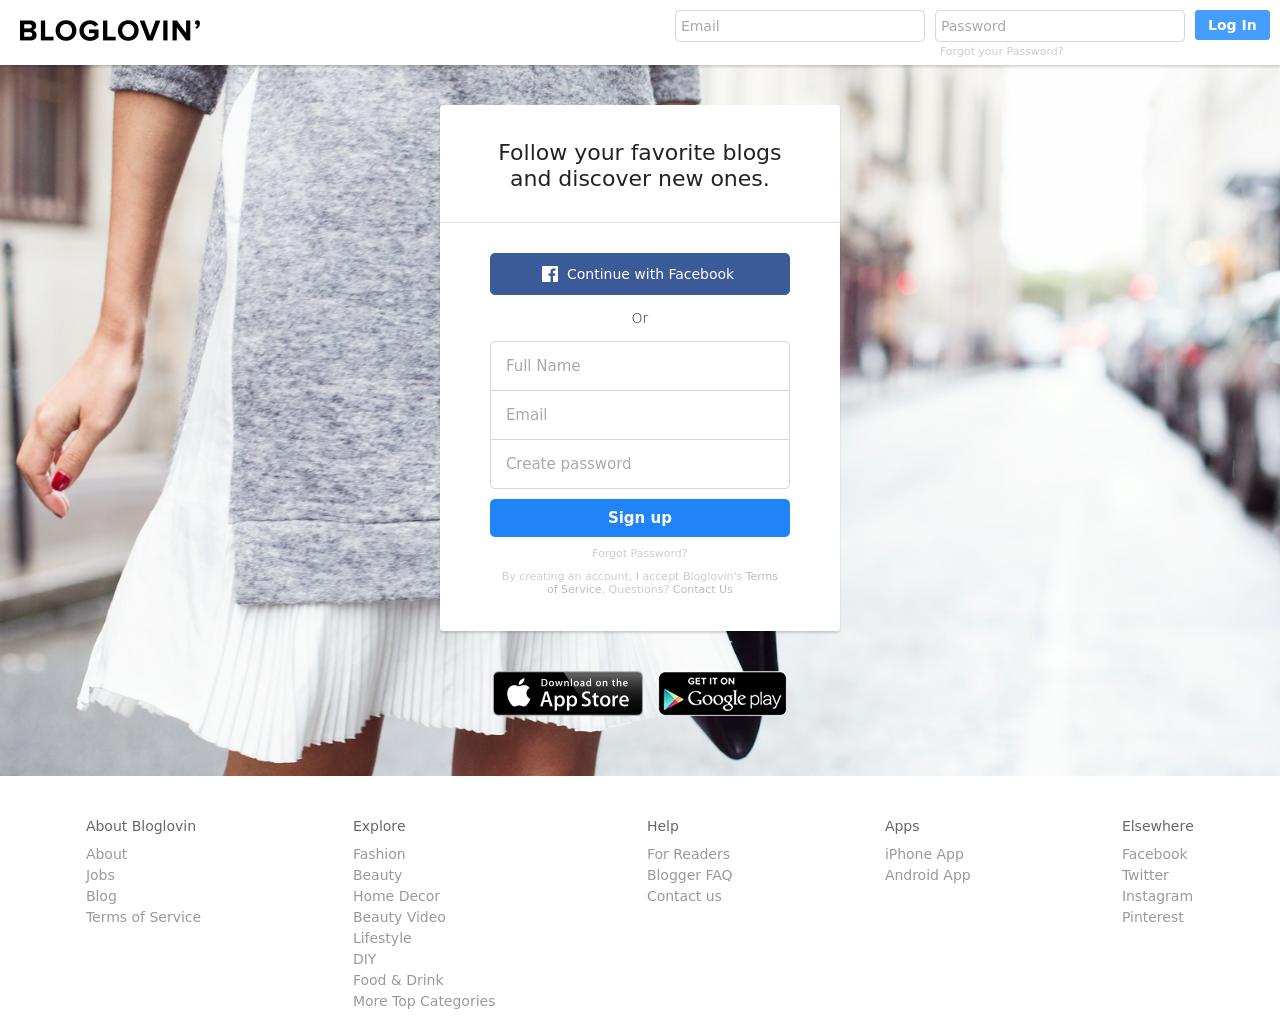 bloglovin-Advertising-Reviews-Pricing